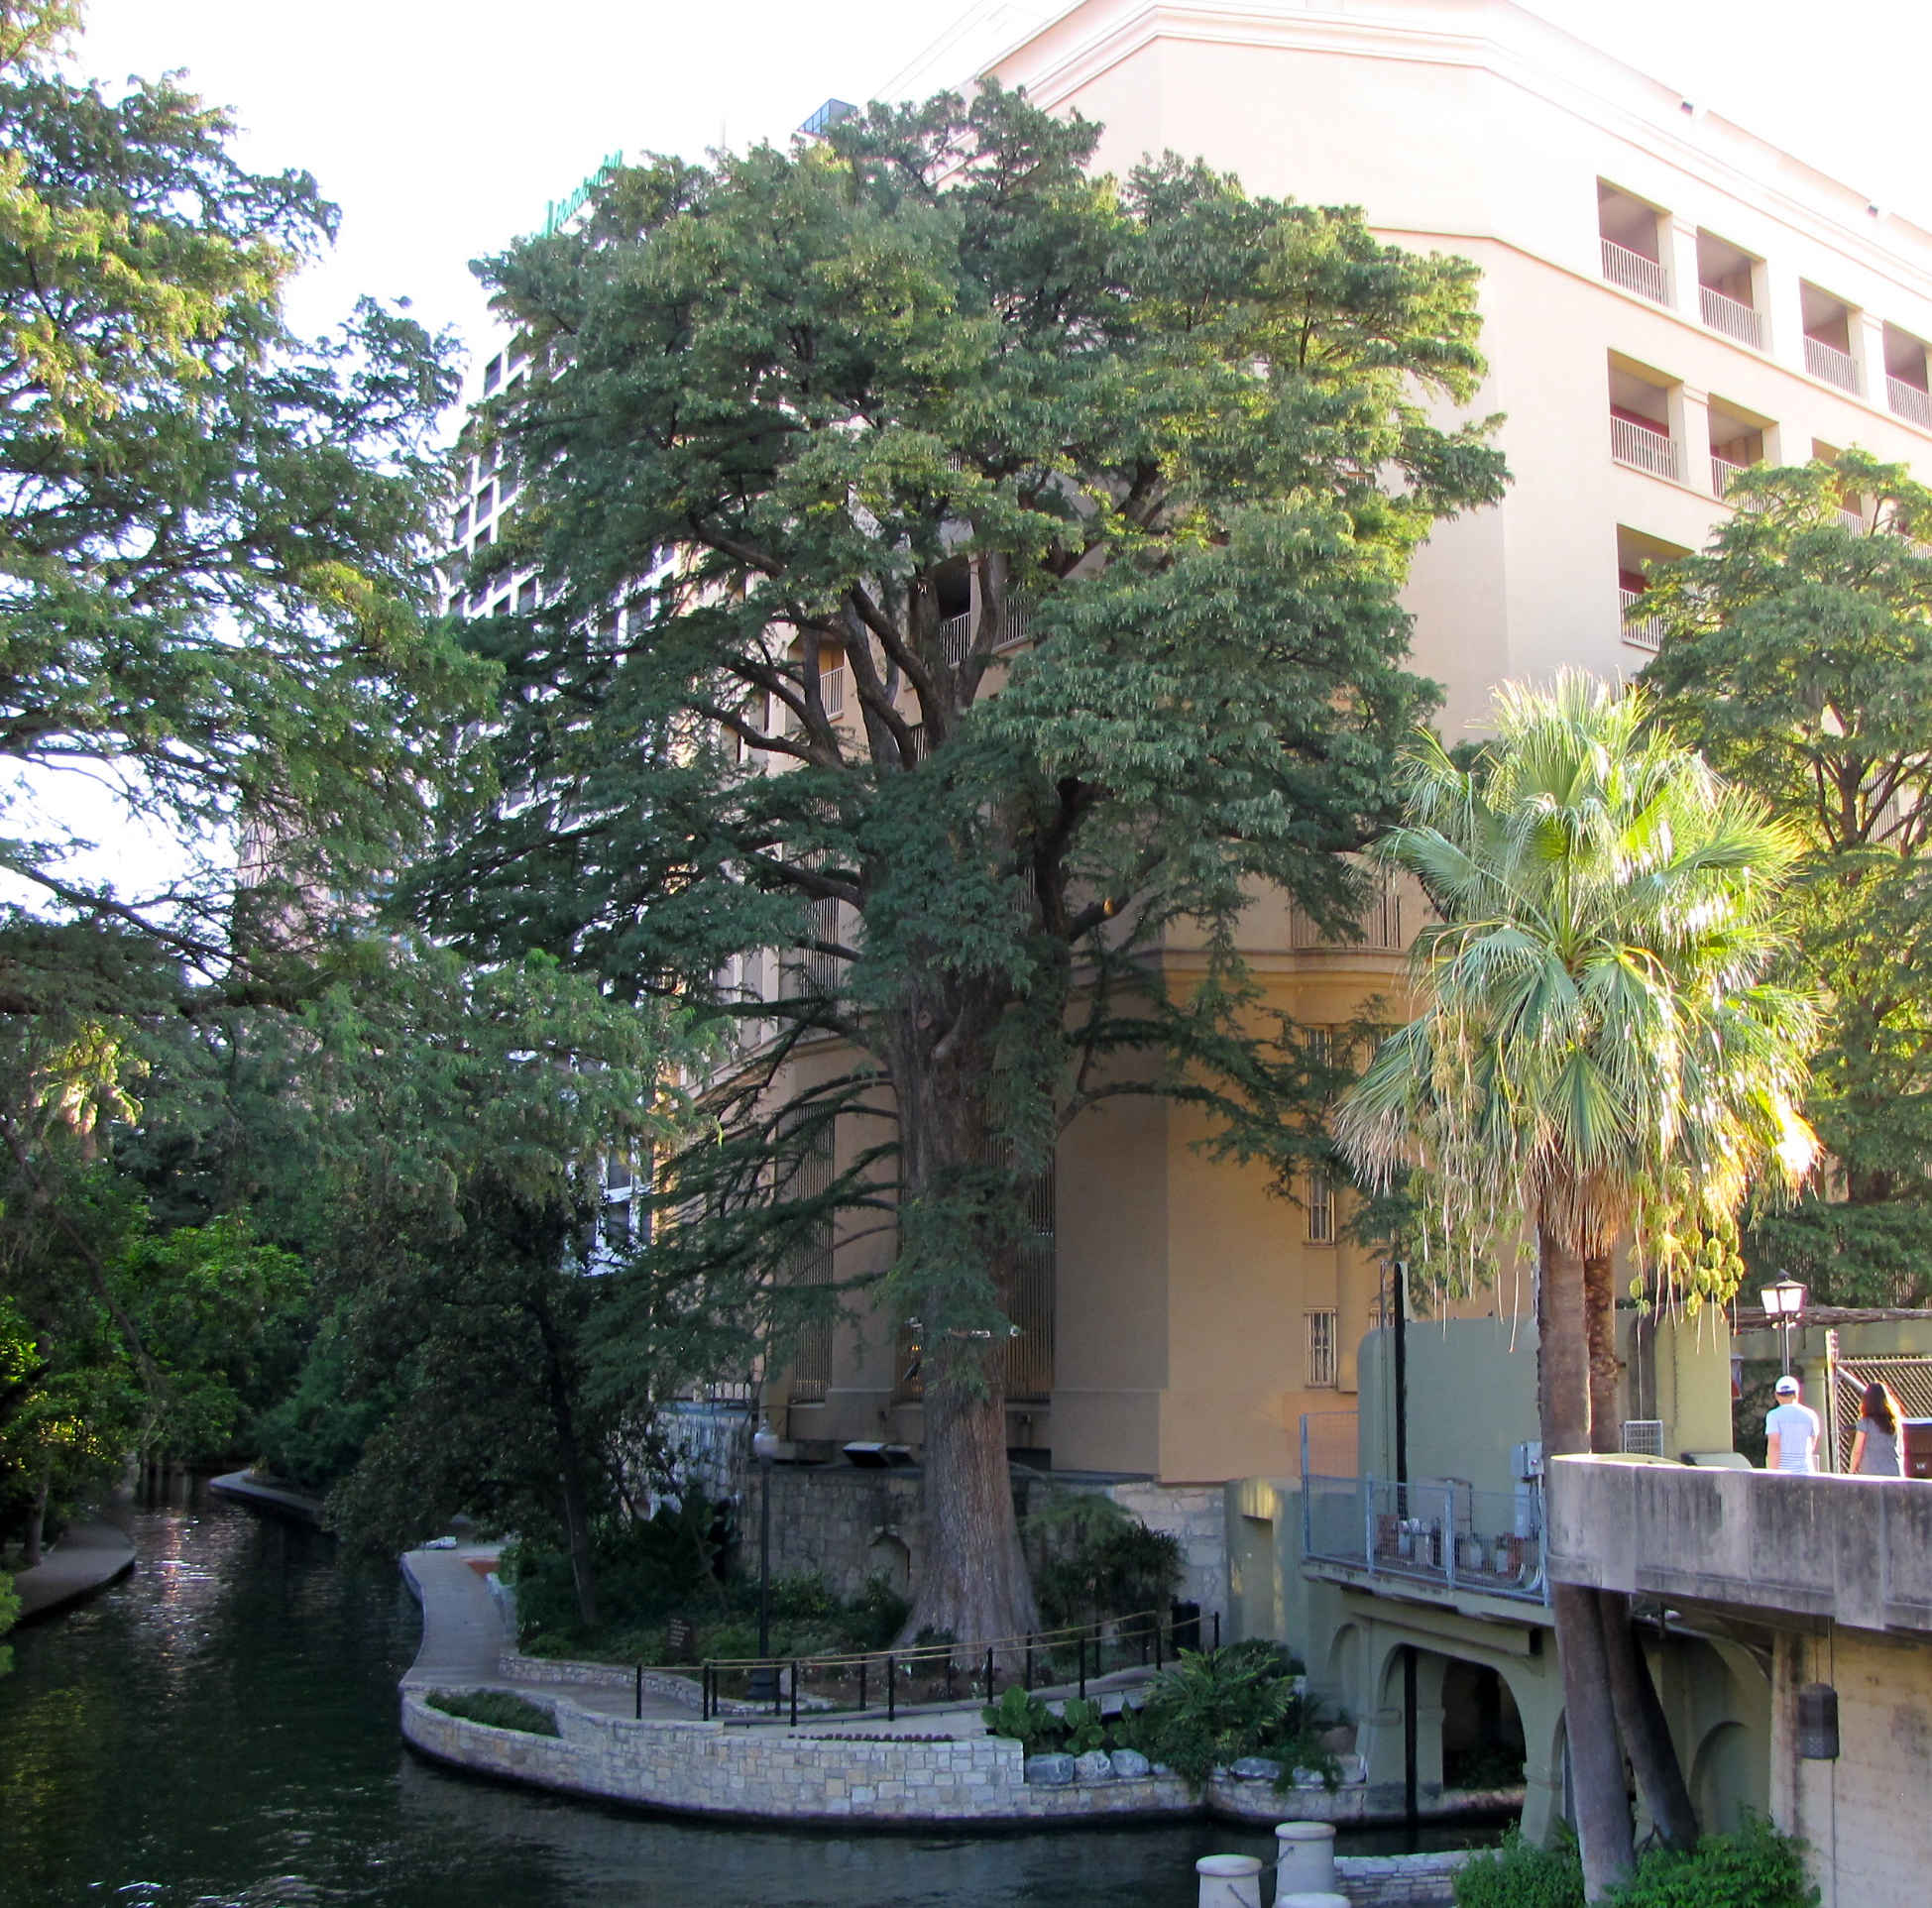 Ben Milam Bald Cypress stands behind the Drury Inn near the Commerce Bridge on the San Antonio River. Courtesy photo.